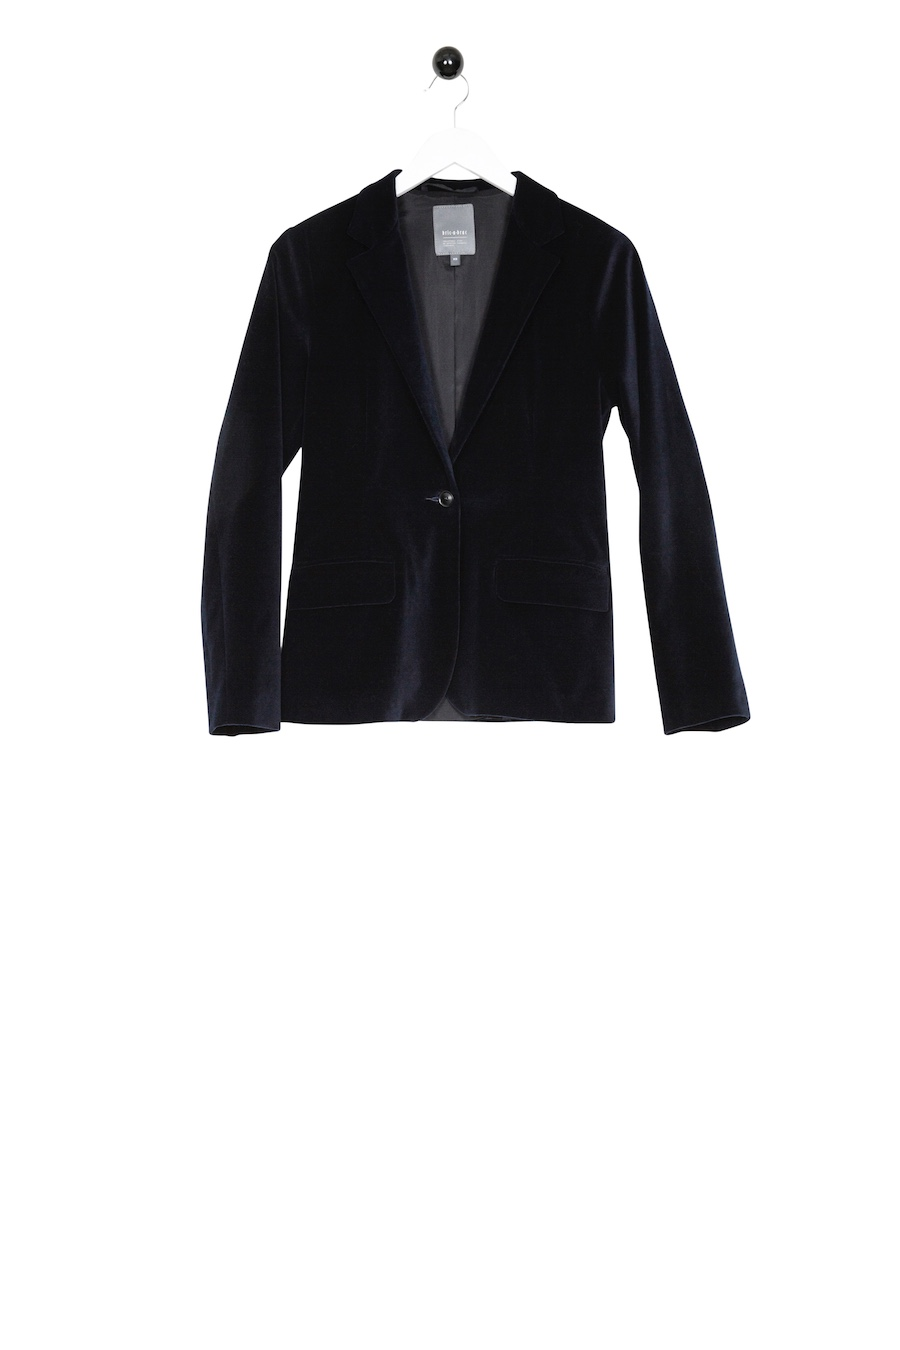 Shian Jacket